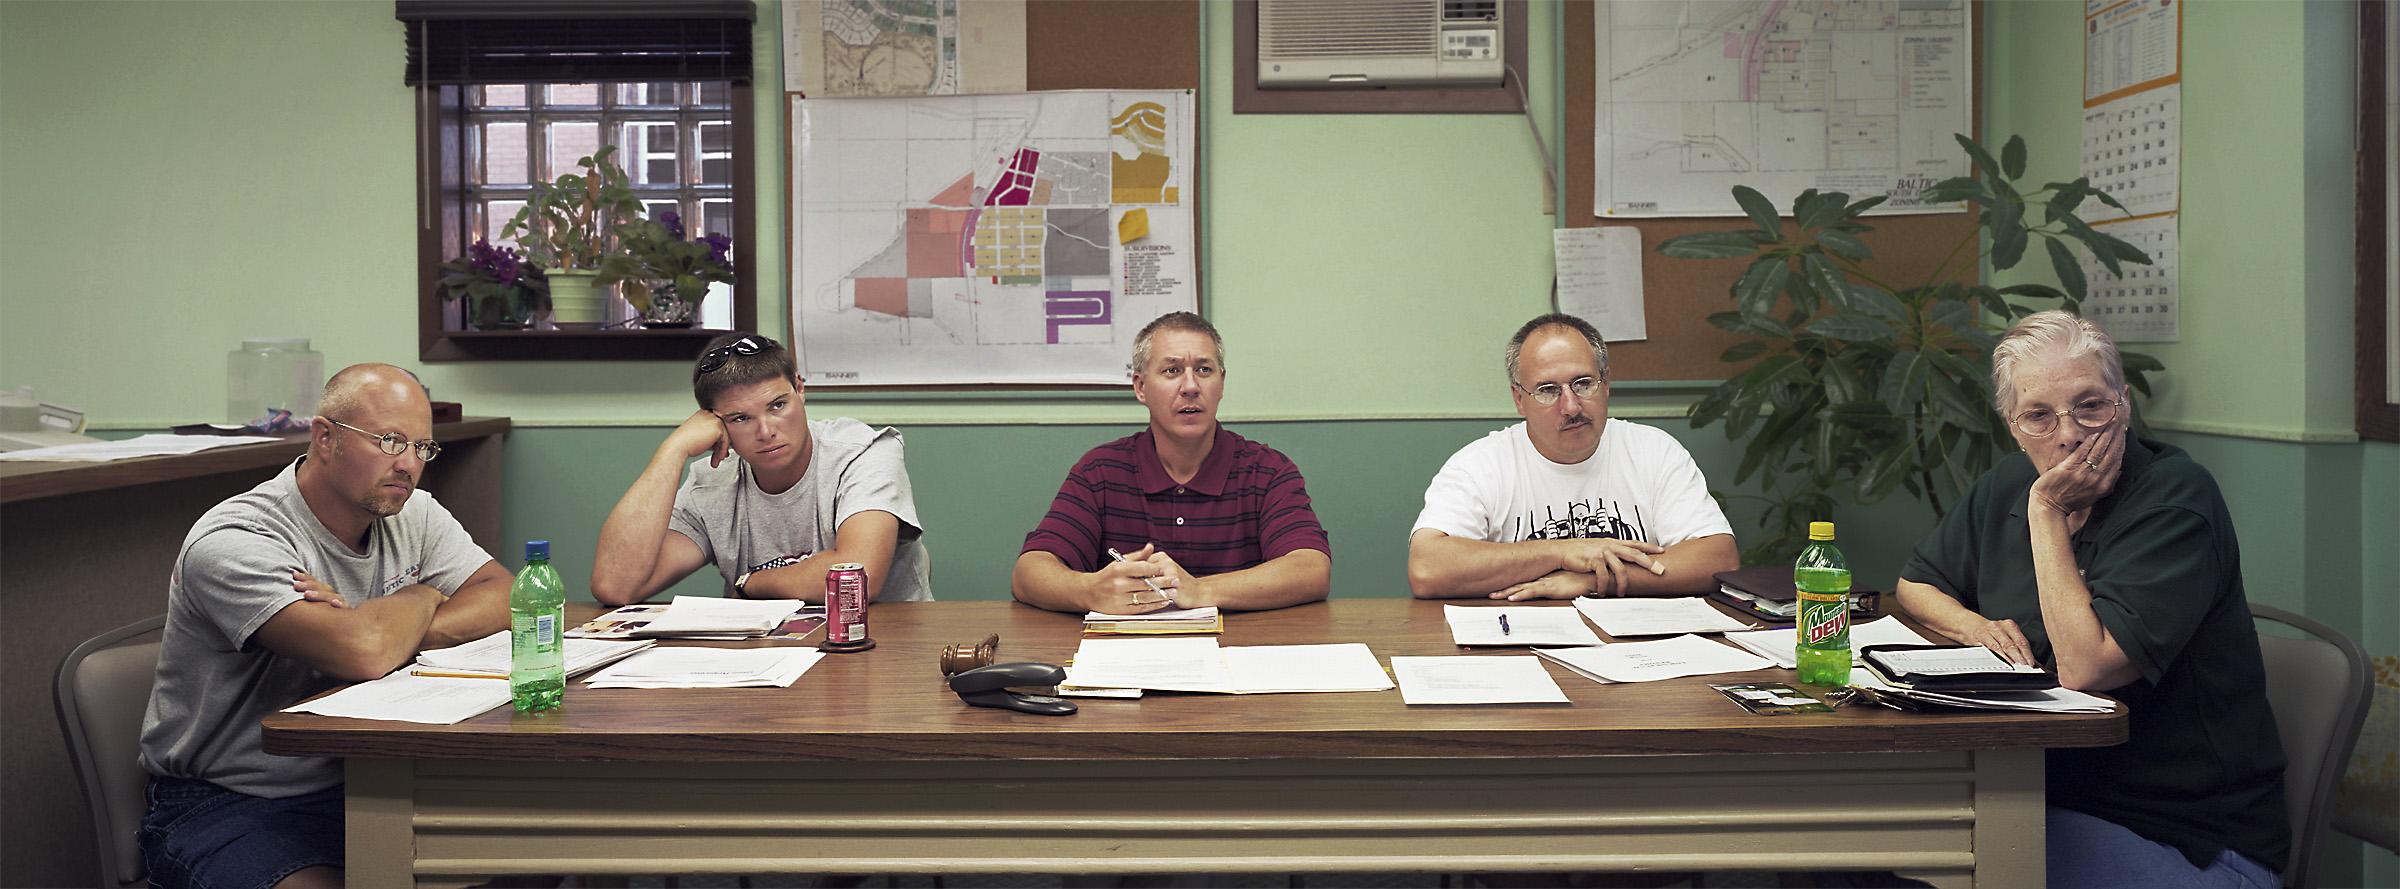 Baltic, South Dakota (population 811) City Council, July 8, 2003 (L to R): Larry Miller, Jason Pittmann, Mike Wendland (Mayor), Doug Burns, Willette Reichert, 2003.